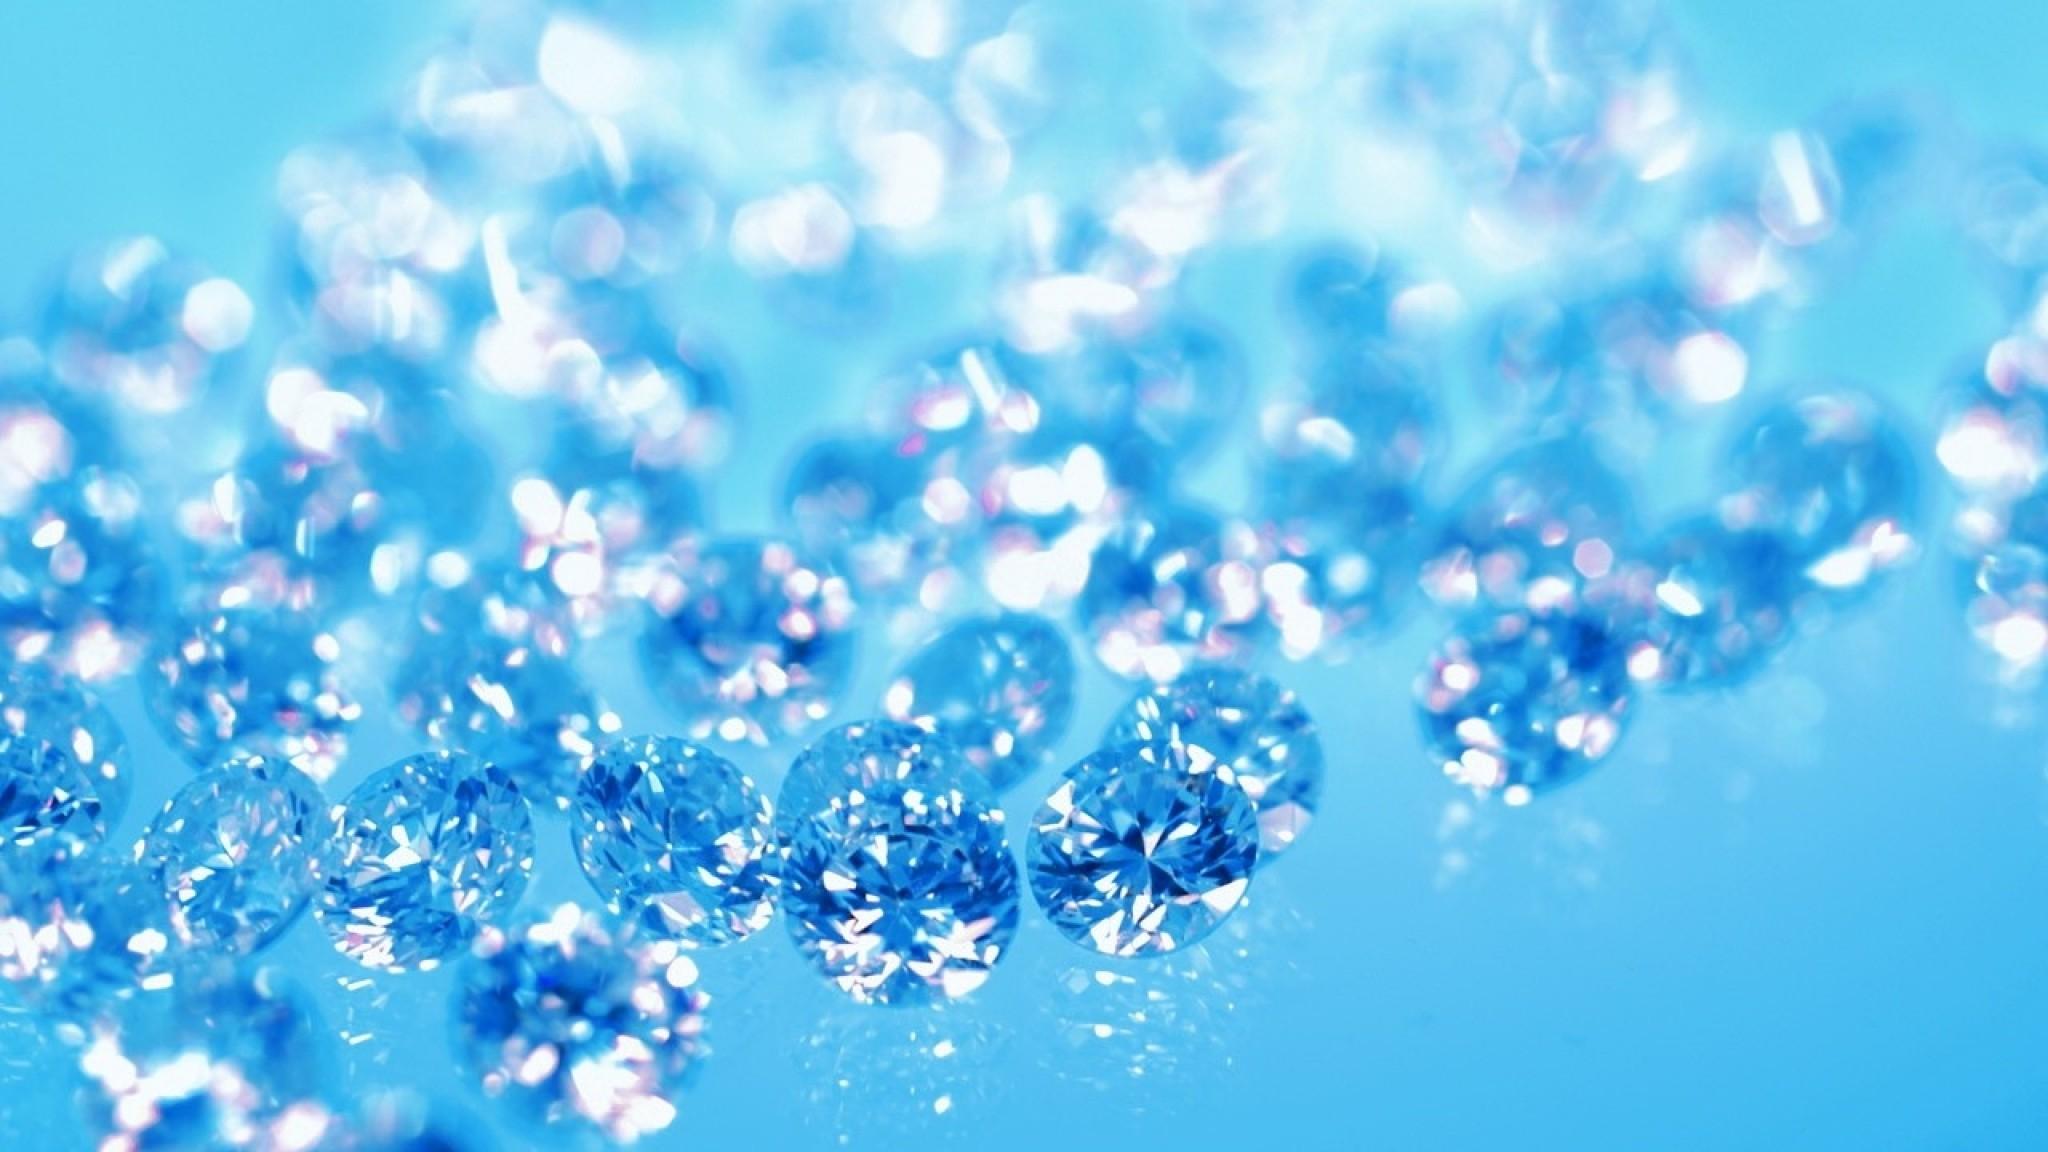 Wallpaper ice, drops, glitter, diamonds